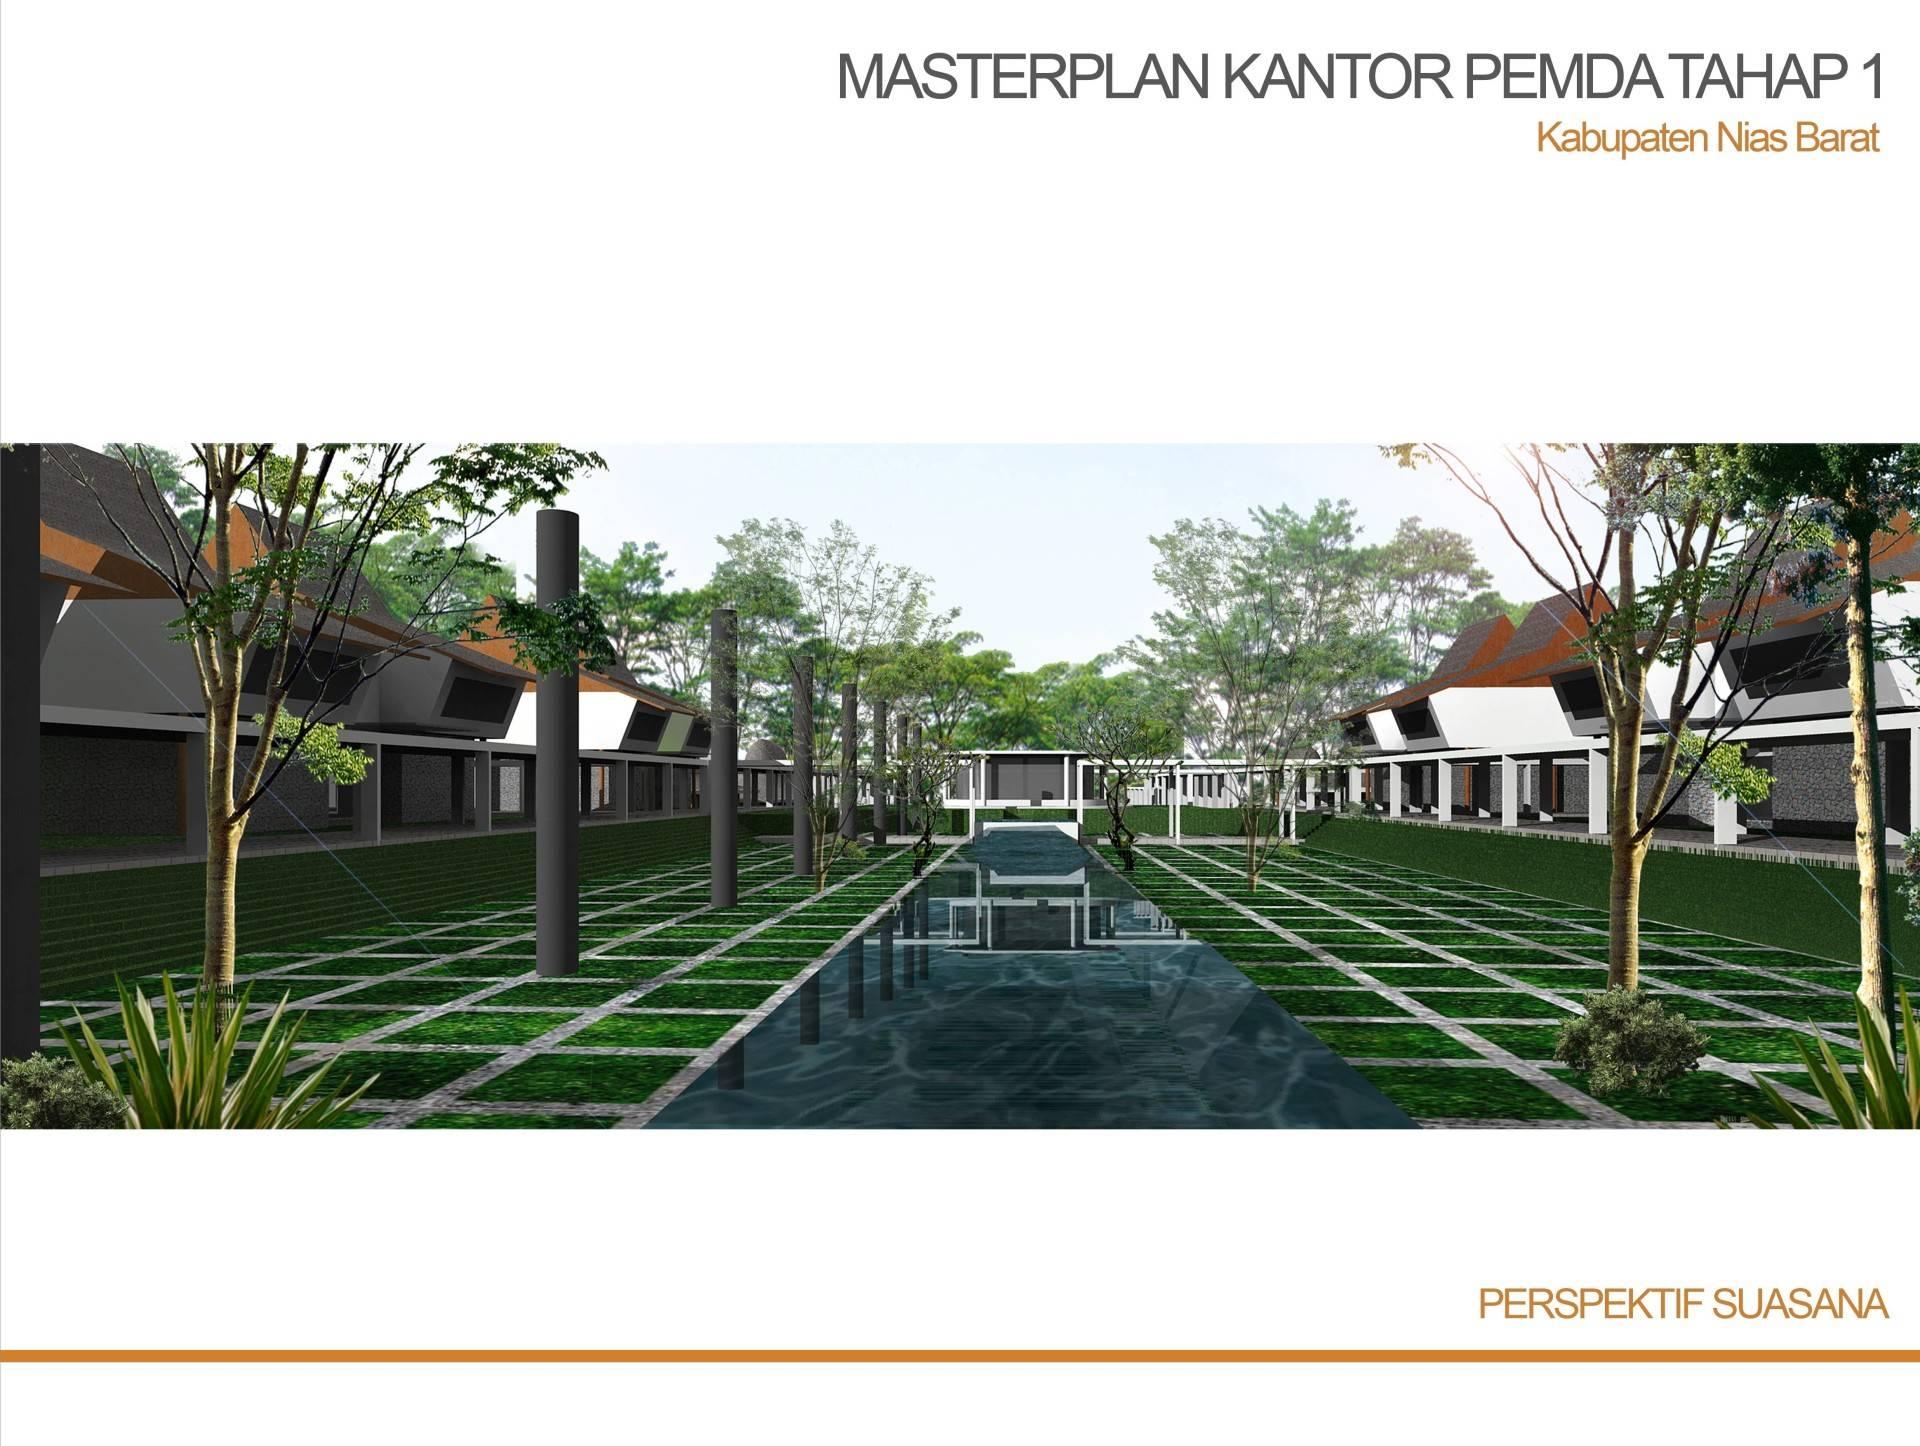 Pt. Daa Interplan Indonesia Masterplan Dprd Nias Barat Kabupaten Nias Barat Kabupaten Nias Barat Masterplan-Dprd-Nias-Barat-Perspektif   7243